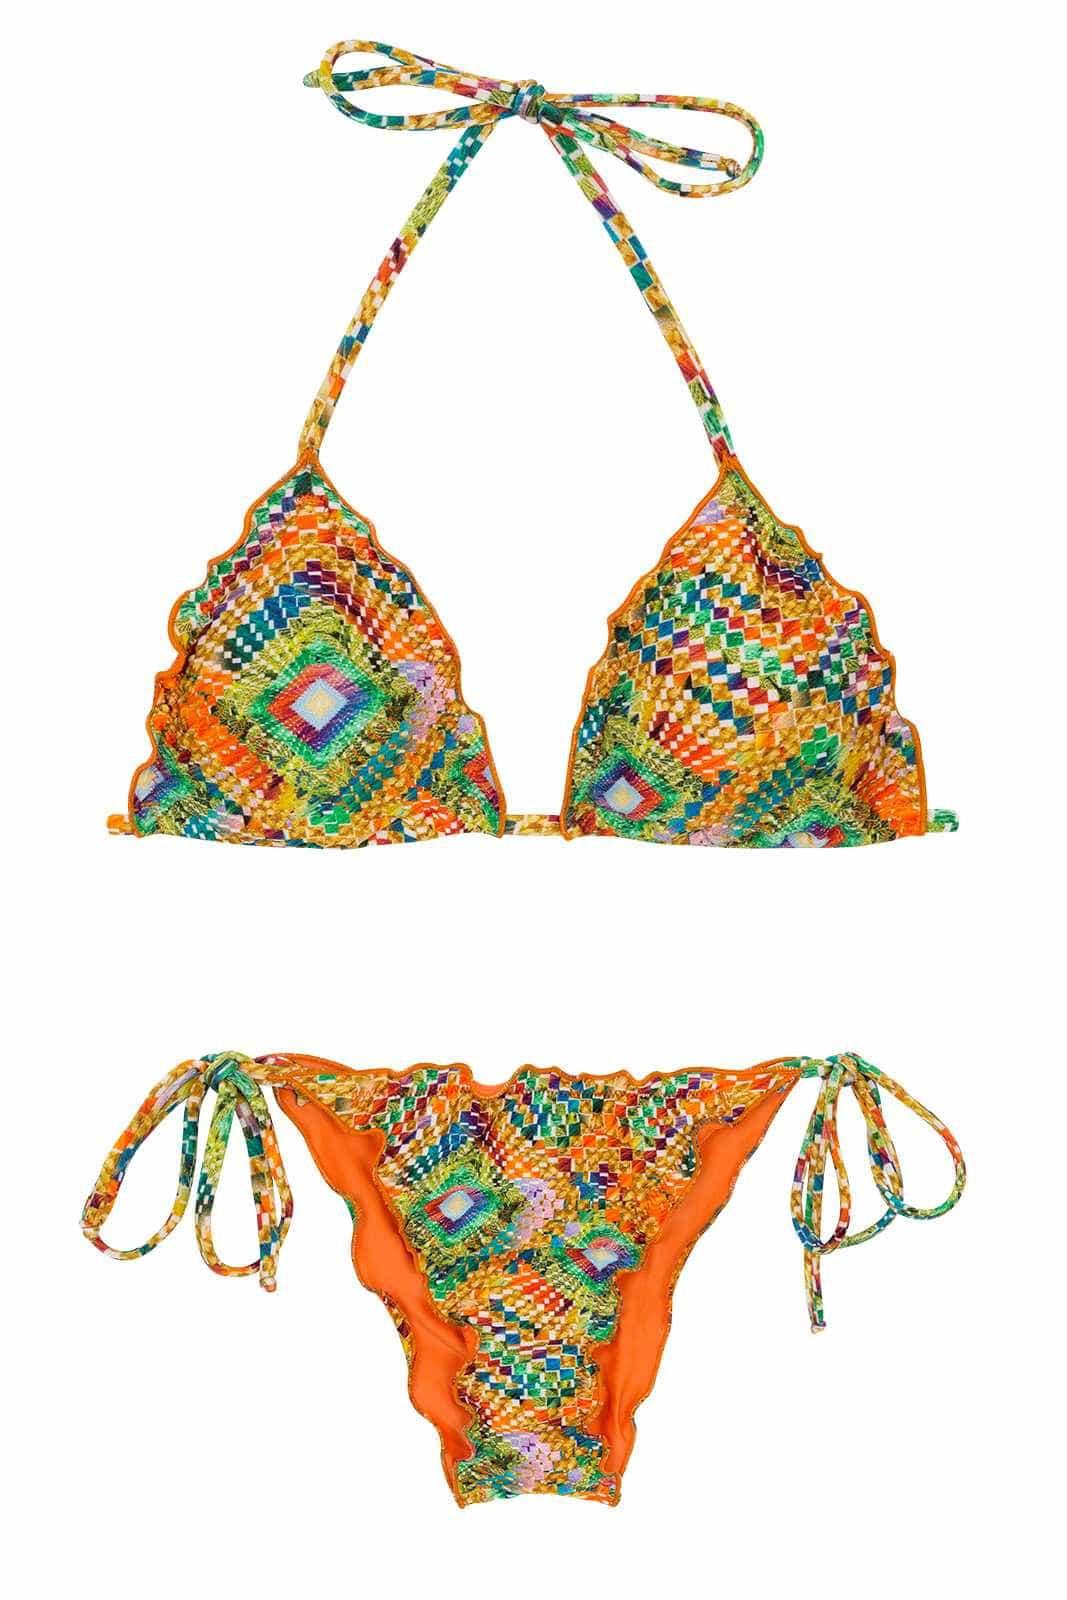 Quando o corpo anseia Vitamina Sea, o remédio é a Brazilian Bikini Shop